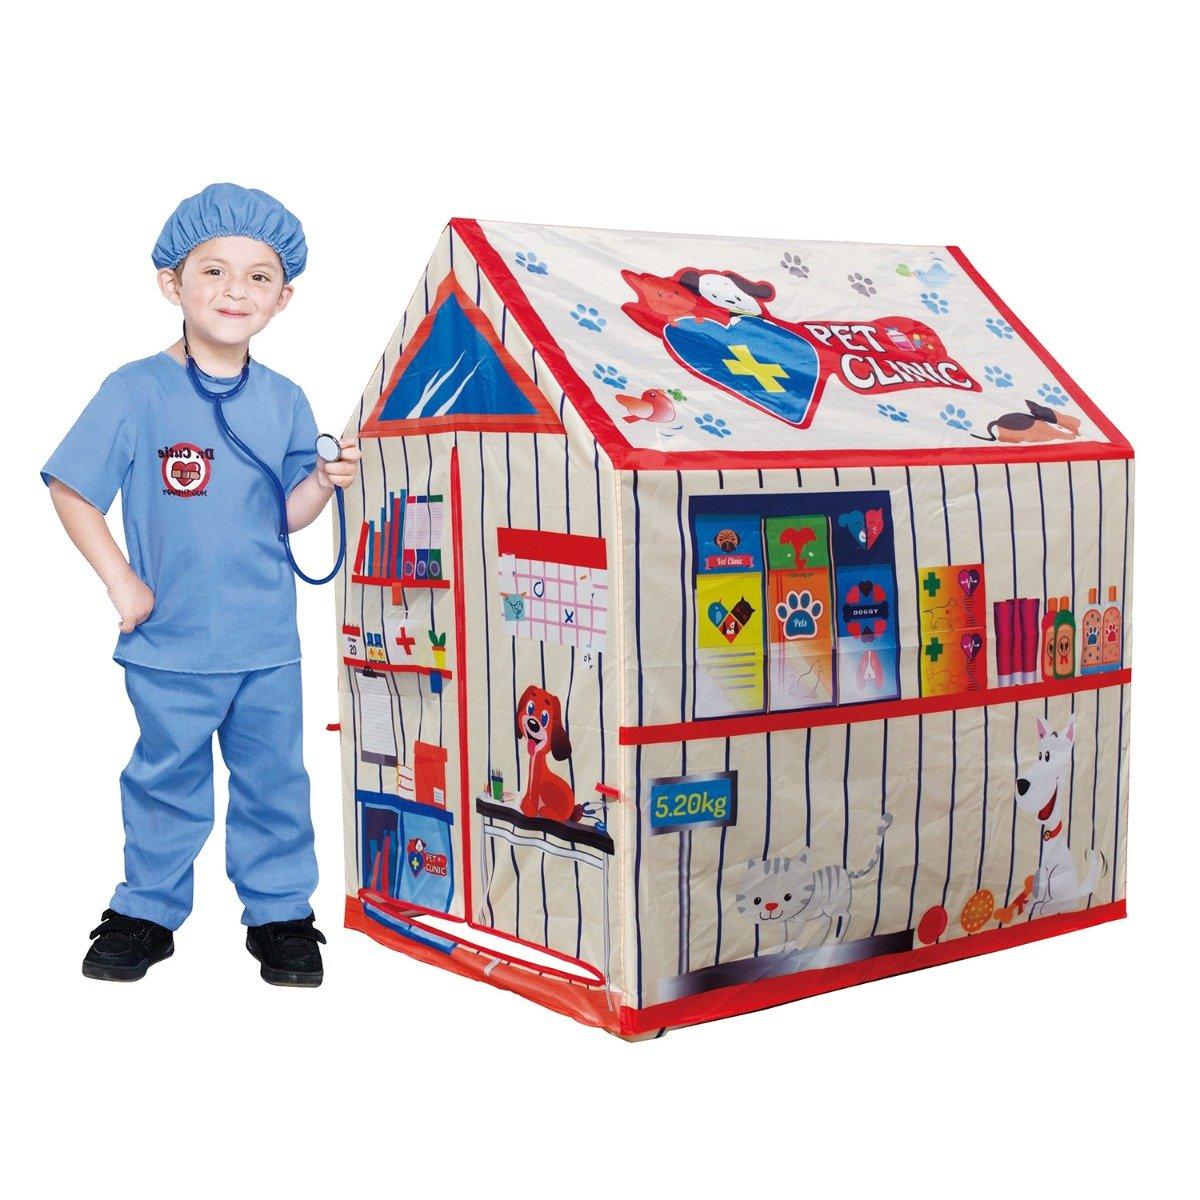 Cort pentru copii Iplay-Toys Pets Clinic Tent